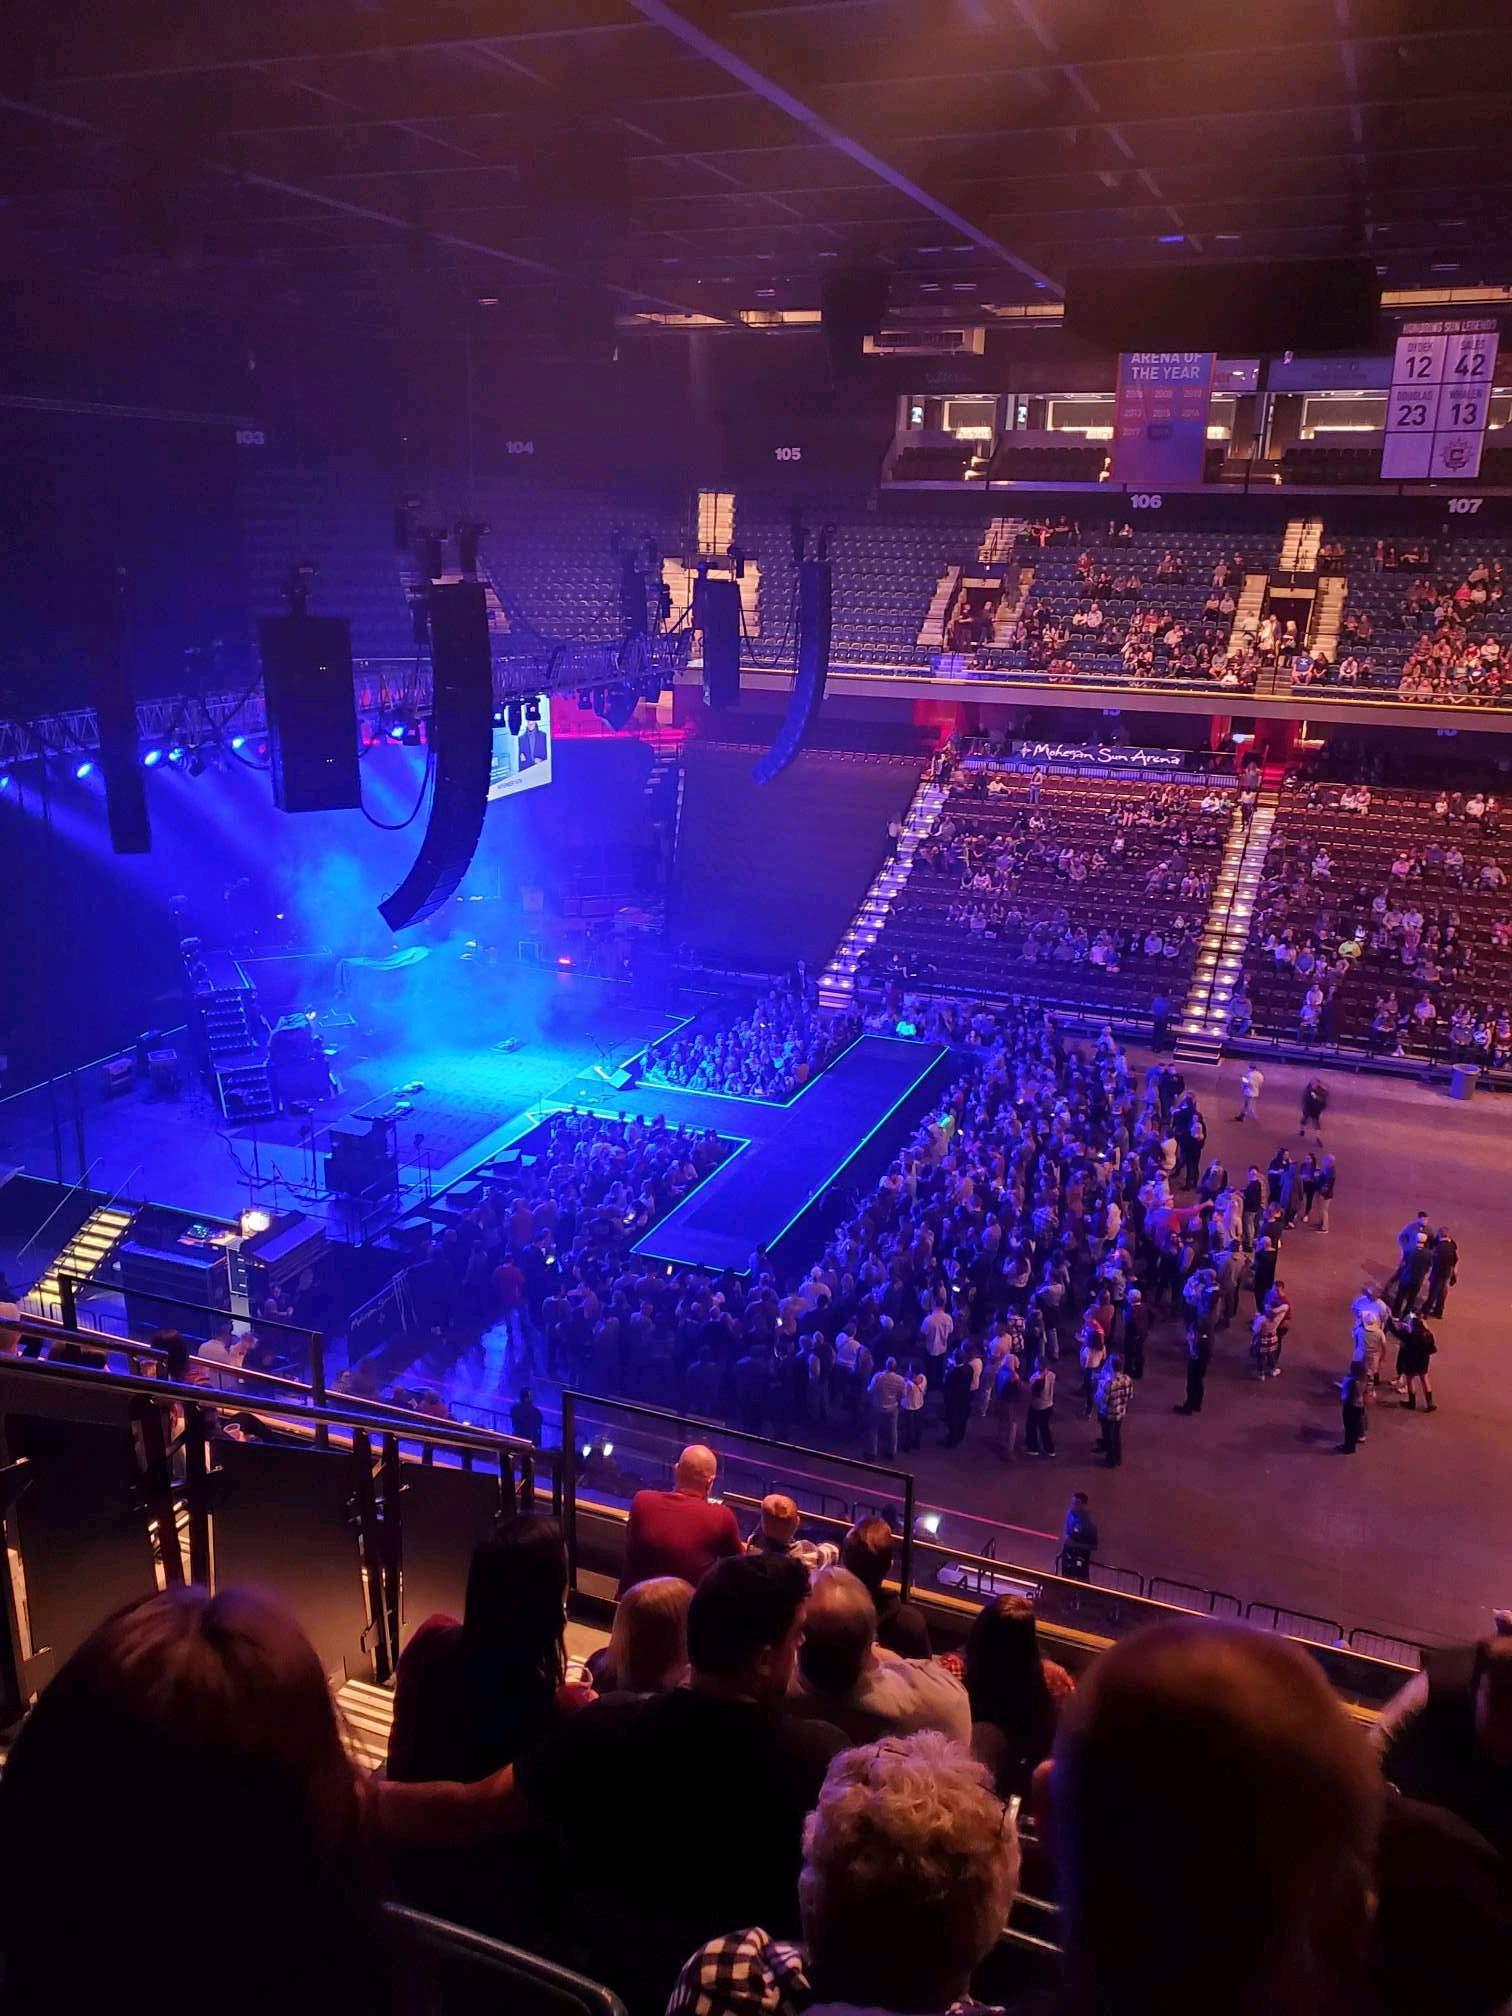 Mohegan Sun Arena Vak 117 Rij j Stoel 15